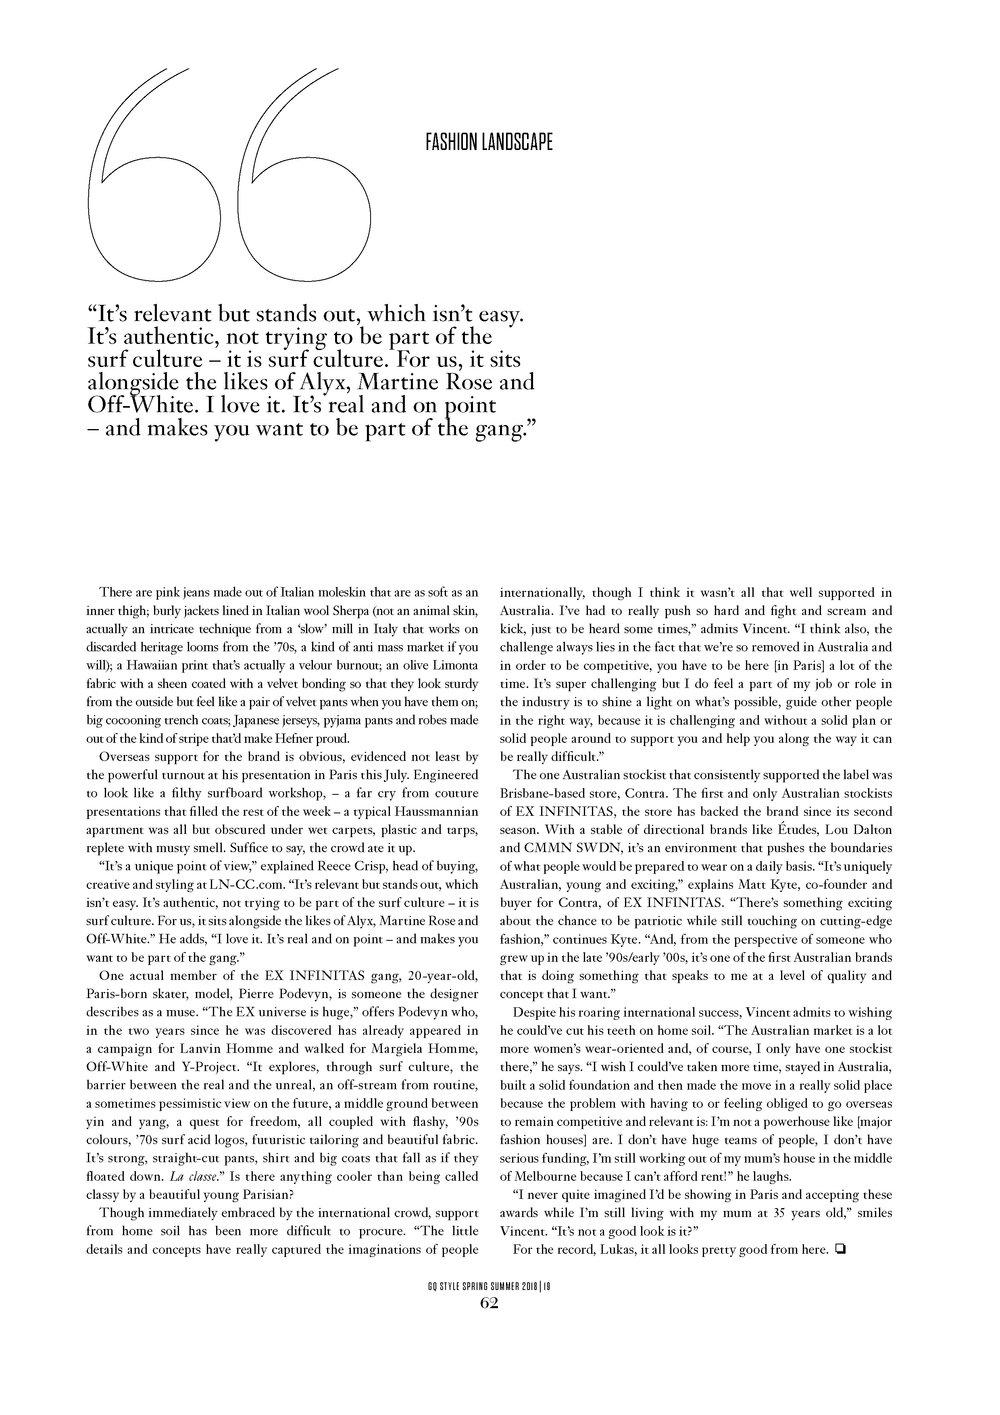 GQ STYLE SPRING SUMMER 18-19 | GQ AUSTRALIA | Ex Infinitas FULL_Page_05.jpg